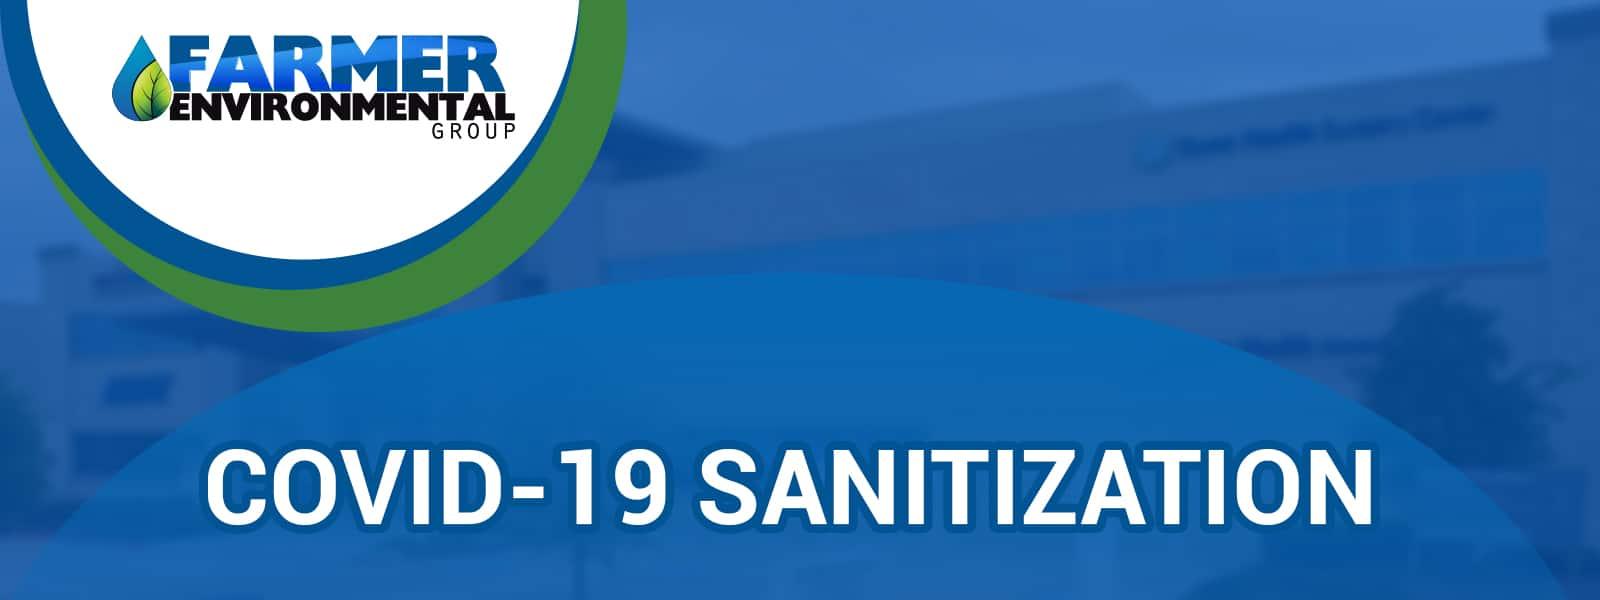 Covid-19-Sanitization-Farmer-Environmental